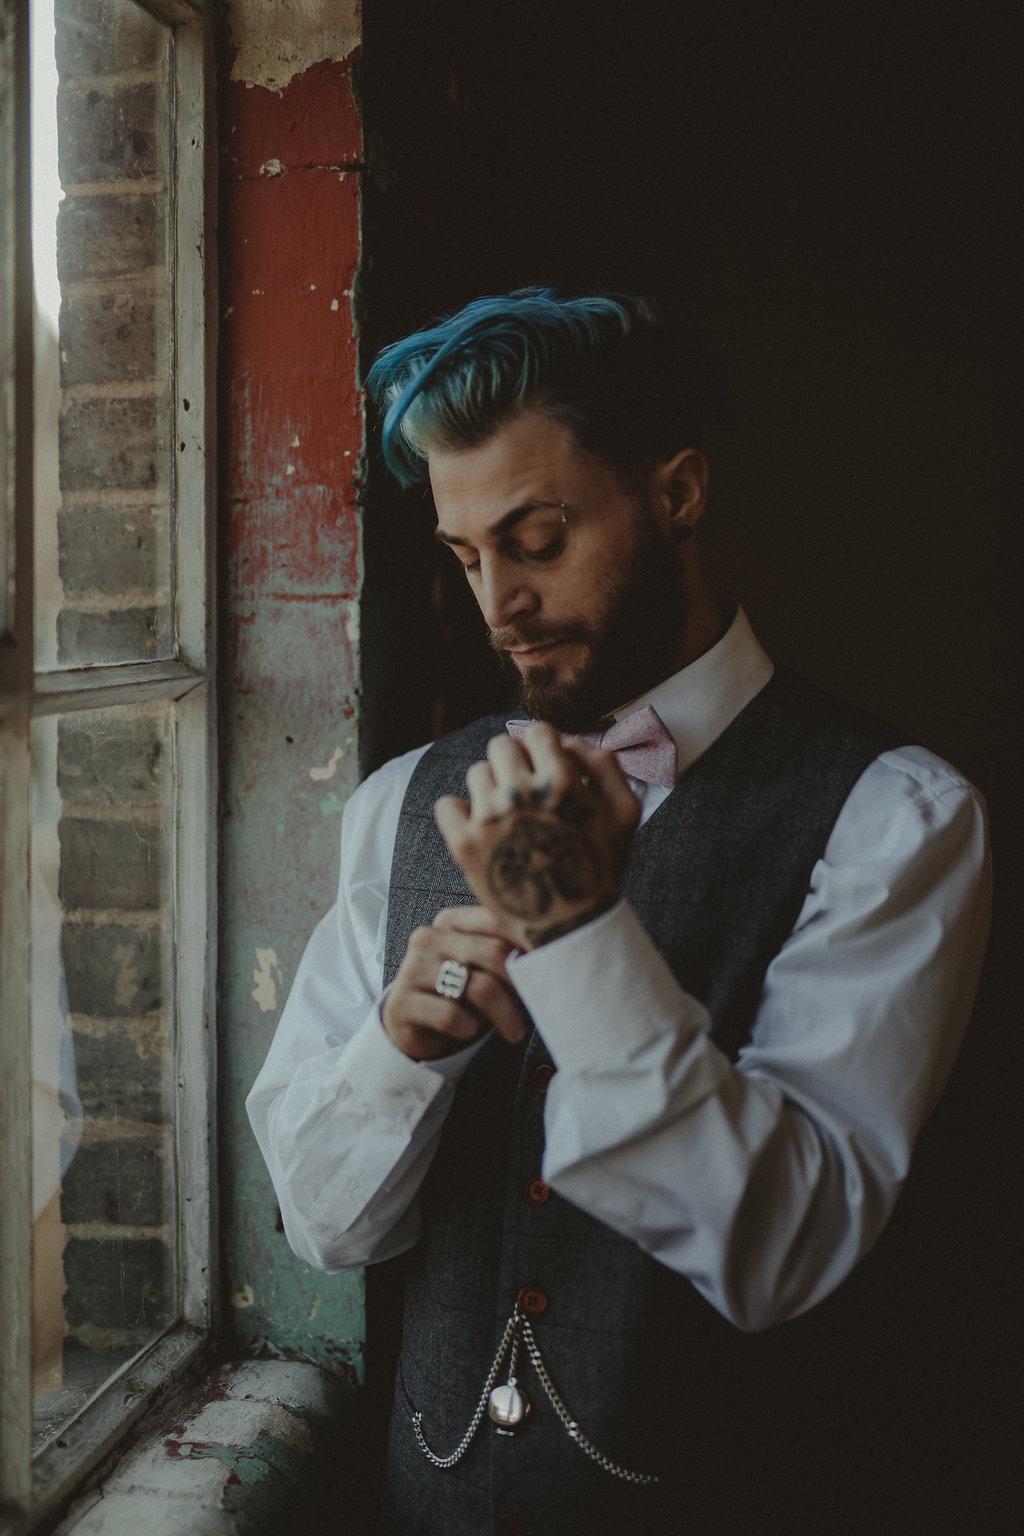 Studio Fotografico Bacci - Steampunk wedding - alternative wedding 46